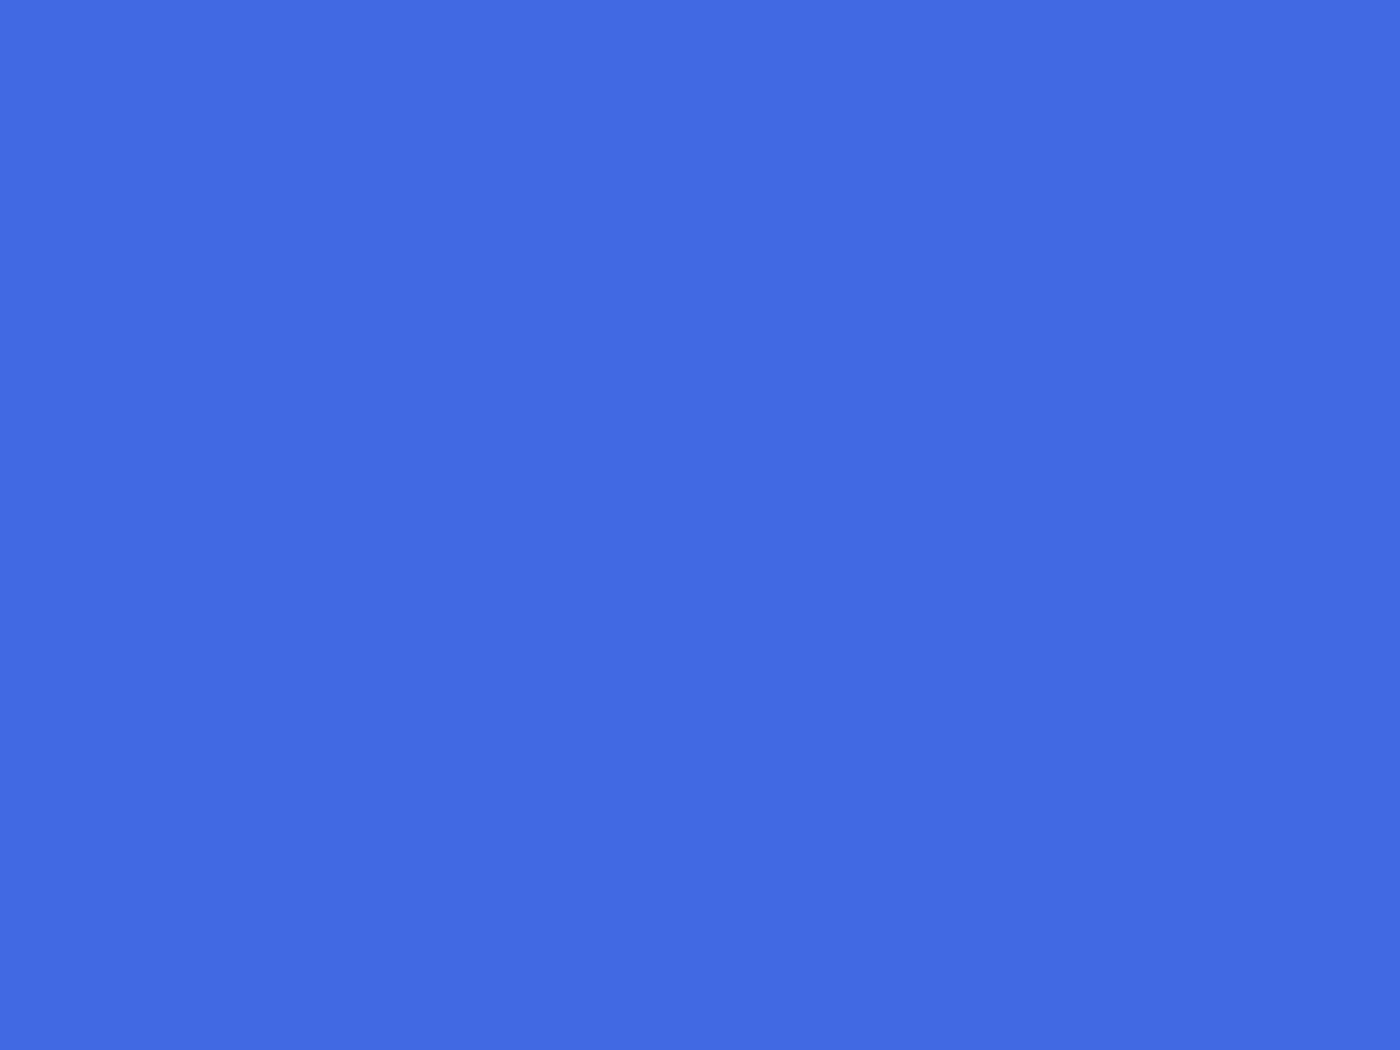 1400x1050 Royal Blue Web Solid Color Background